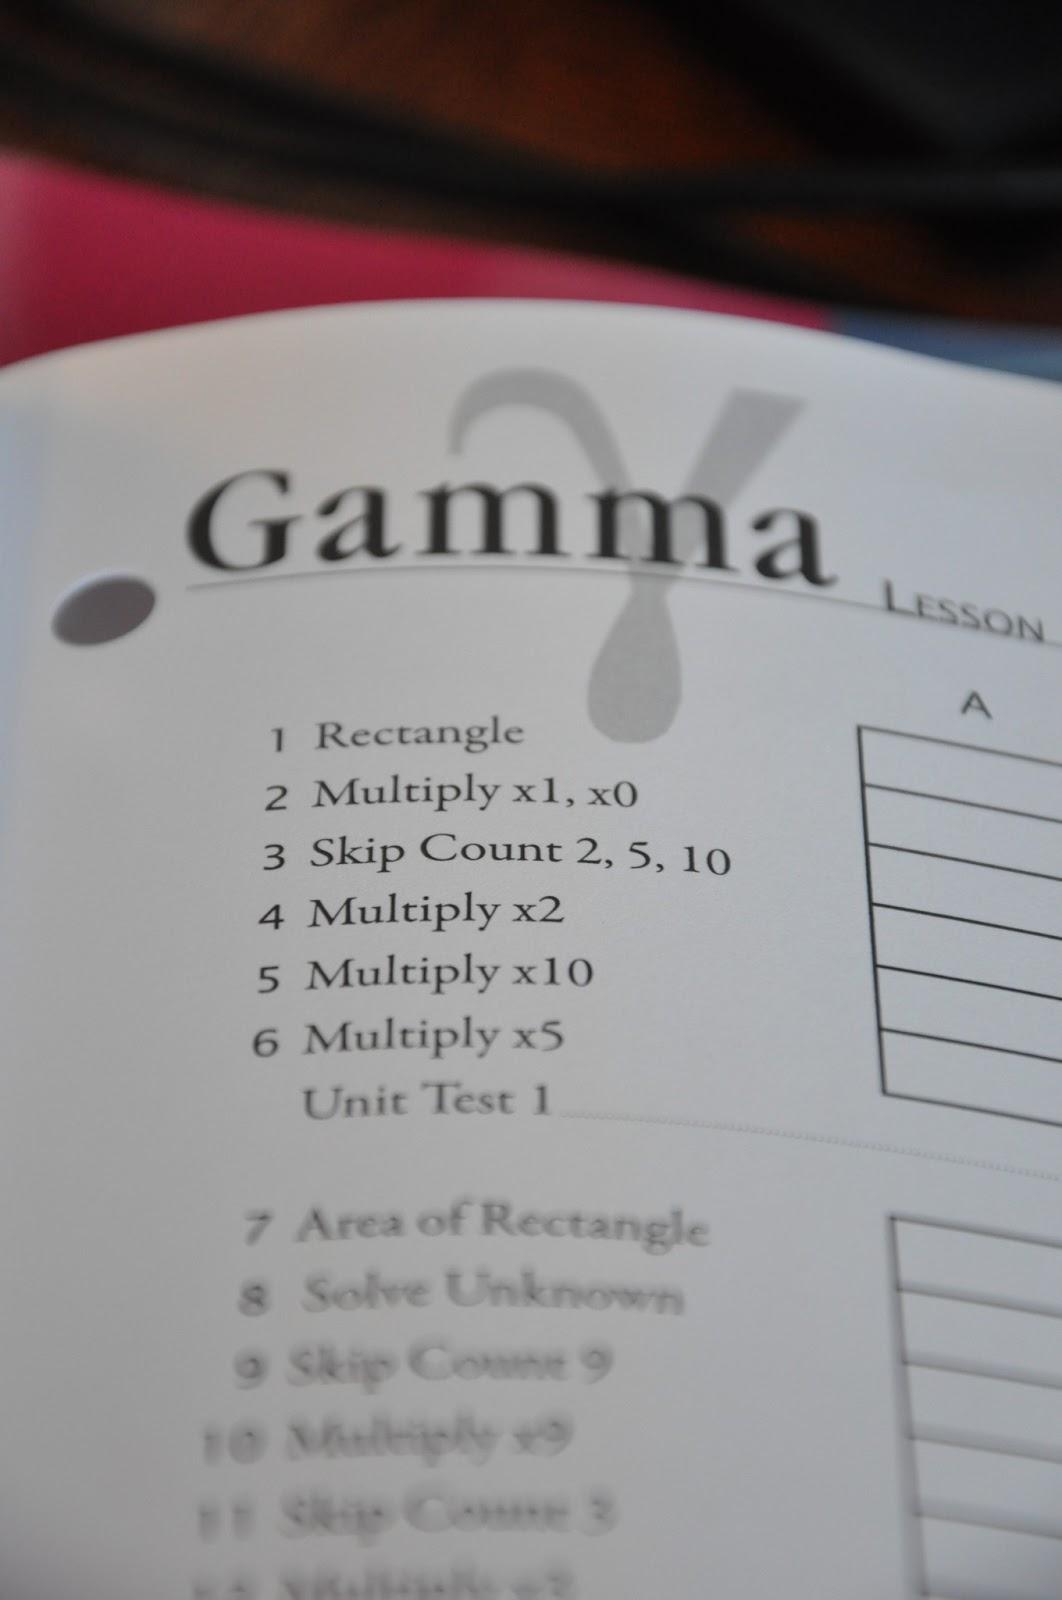 Abc Krug Academy Gamma Gamma Gamma